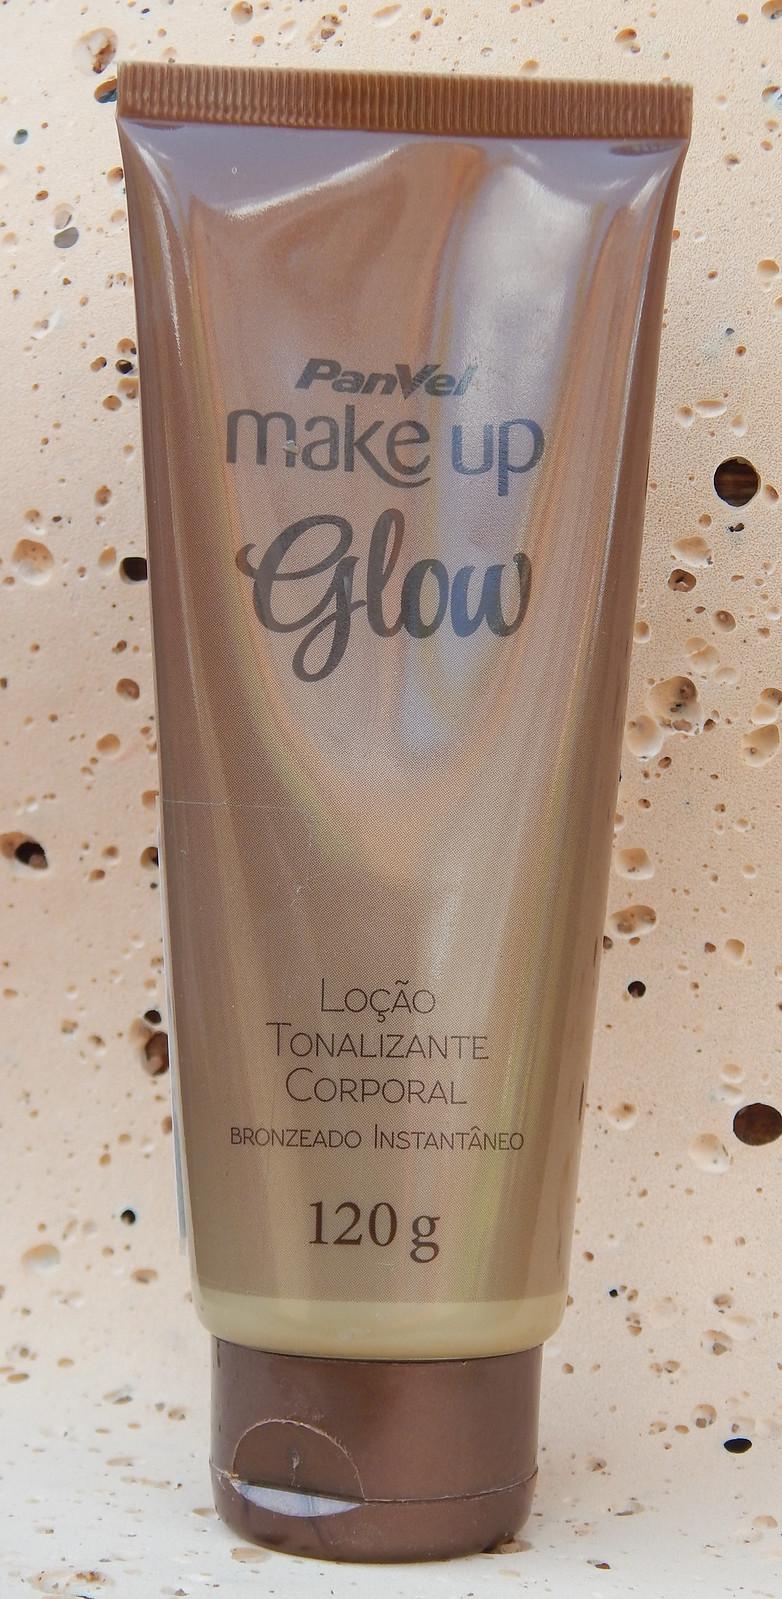 Loção Tonalizante Glow  Panvel Makeup- Resenha